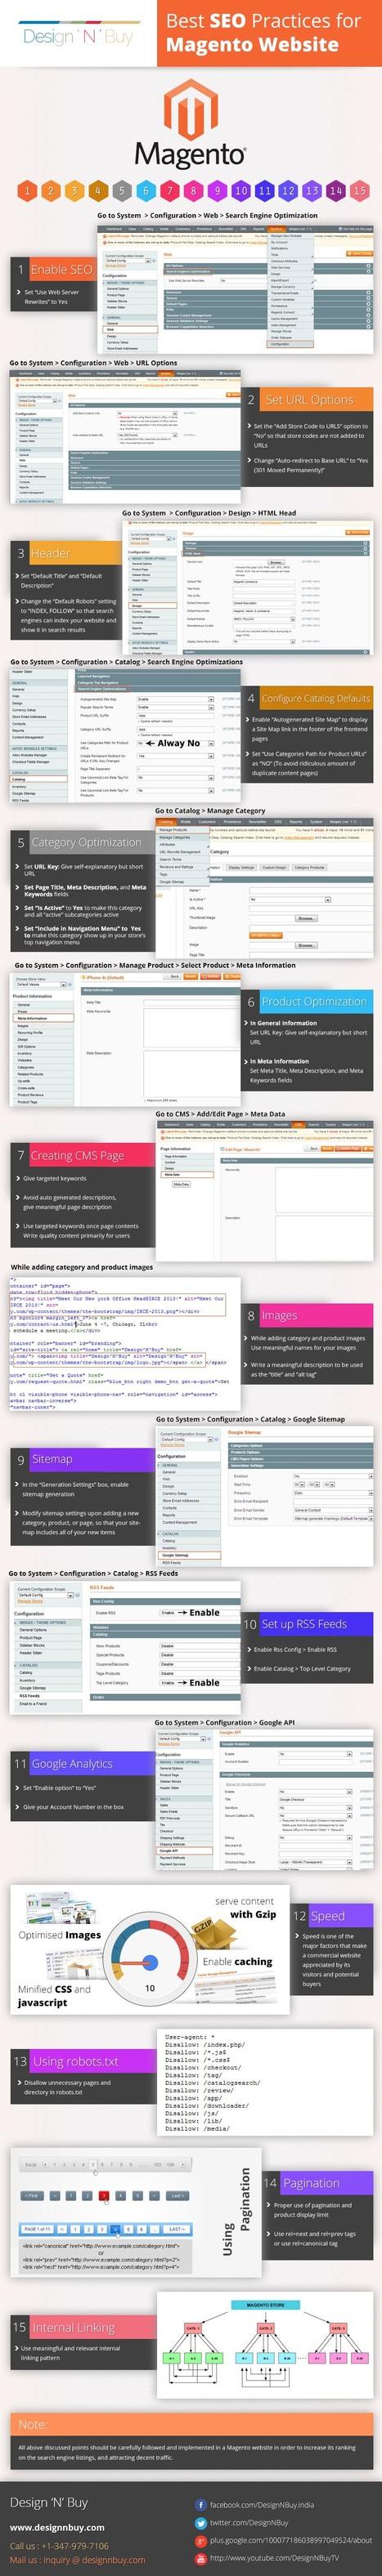 Best SEO Practices for Magento Website [Infographic] | Digital Marketing | Scoop.it